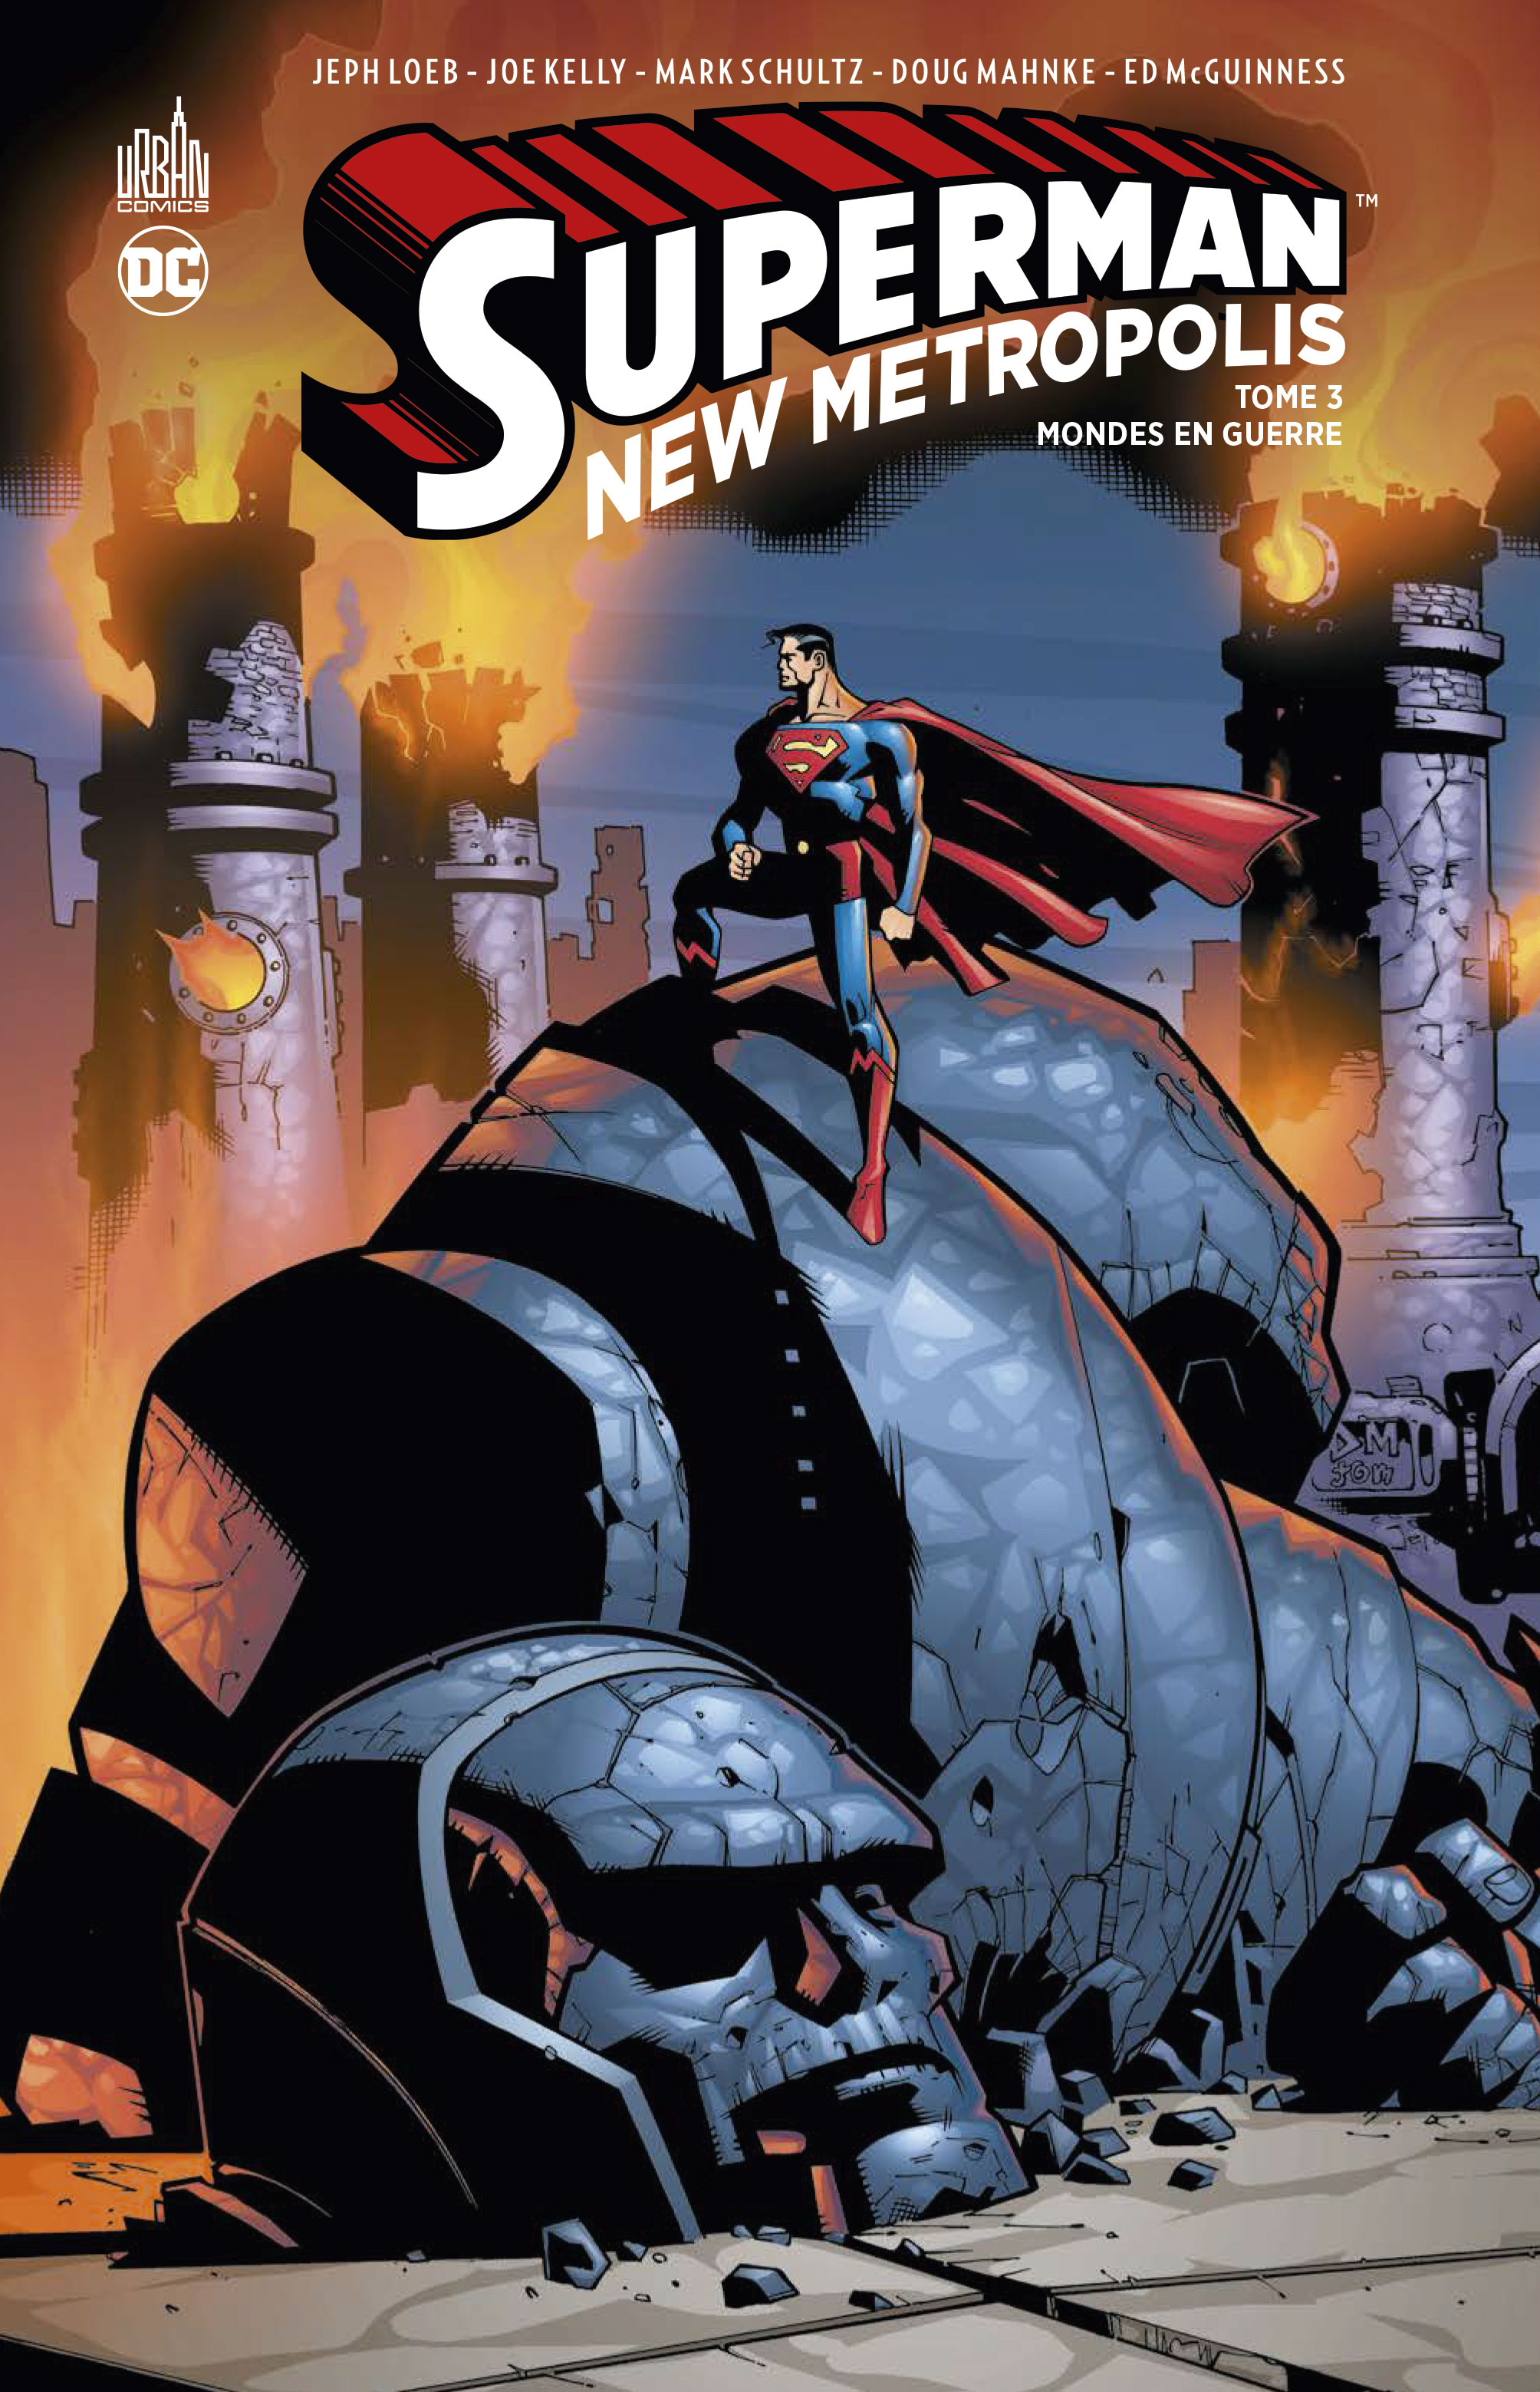 Superman - New Metropolis 3